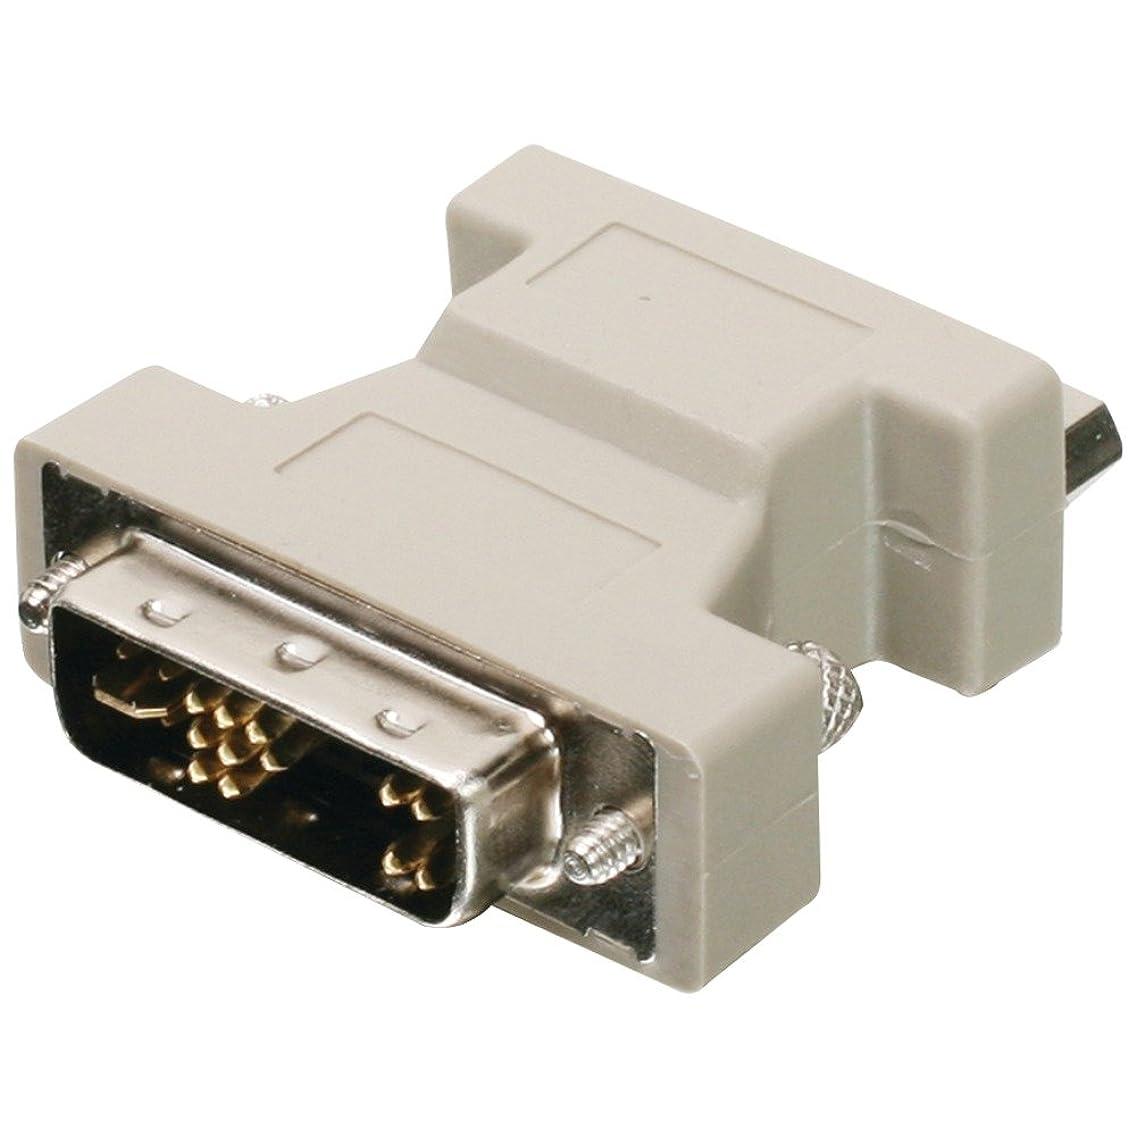 IOGEAR DVI-A, M To VGA, F Adapter, GDVIMVGAF